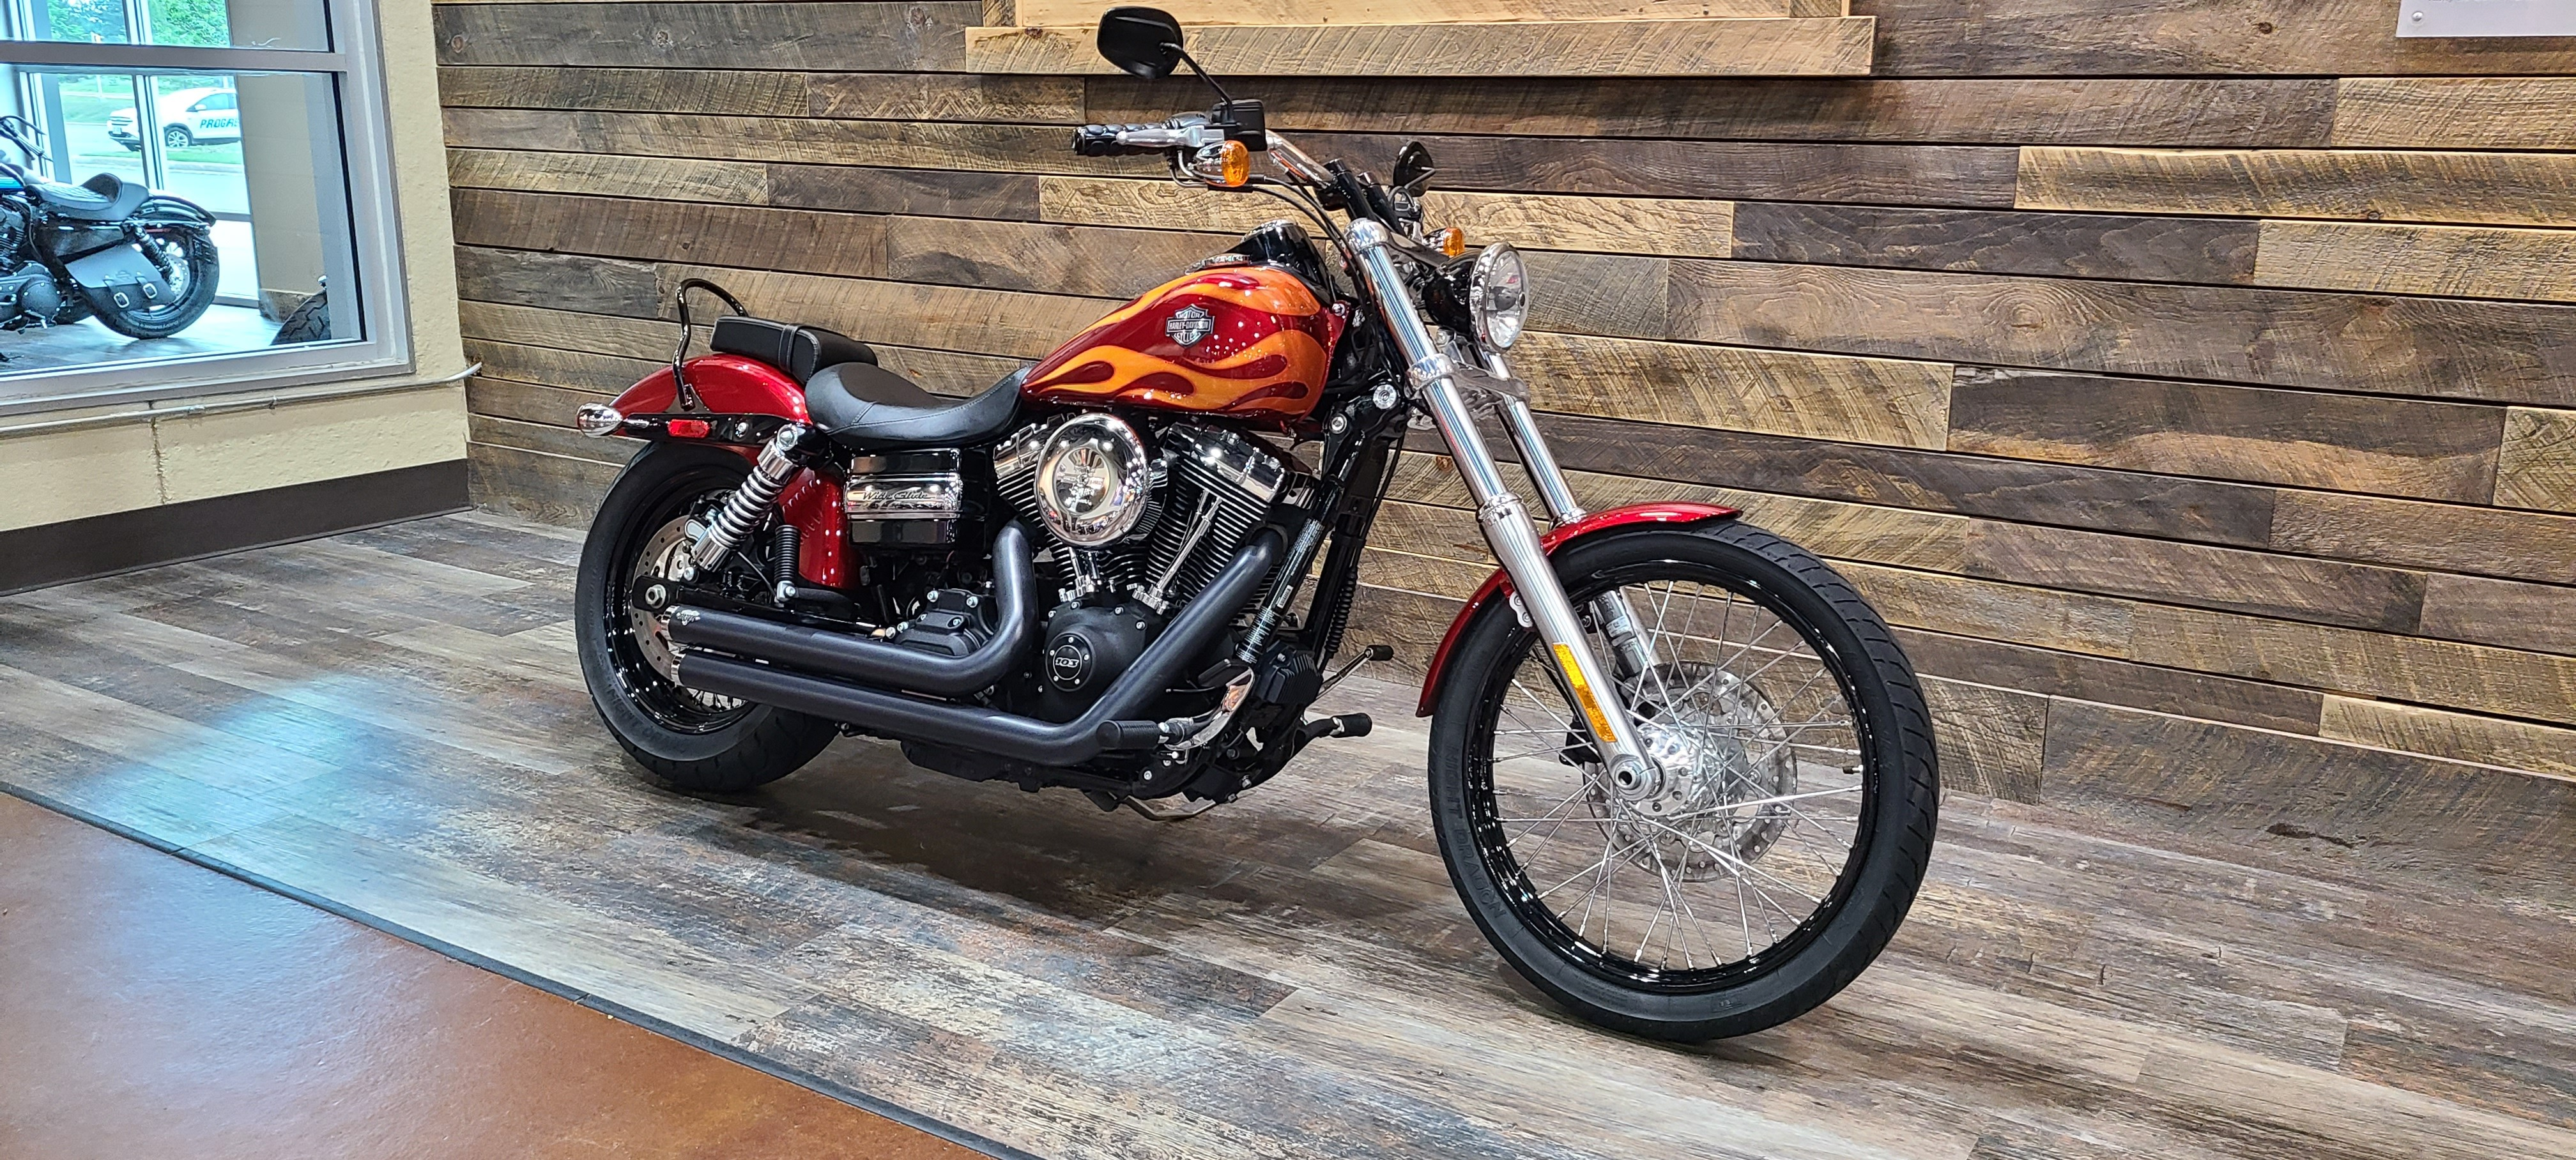 2012 Harley-Davidson Dyna Glide Wide Glide at Bull Falls Harley-Davidson